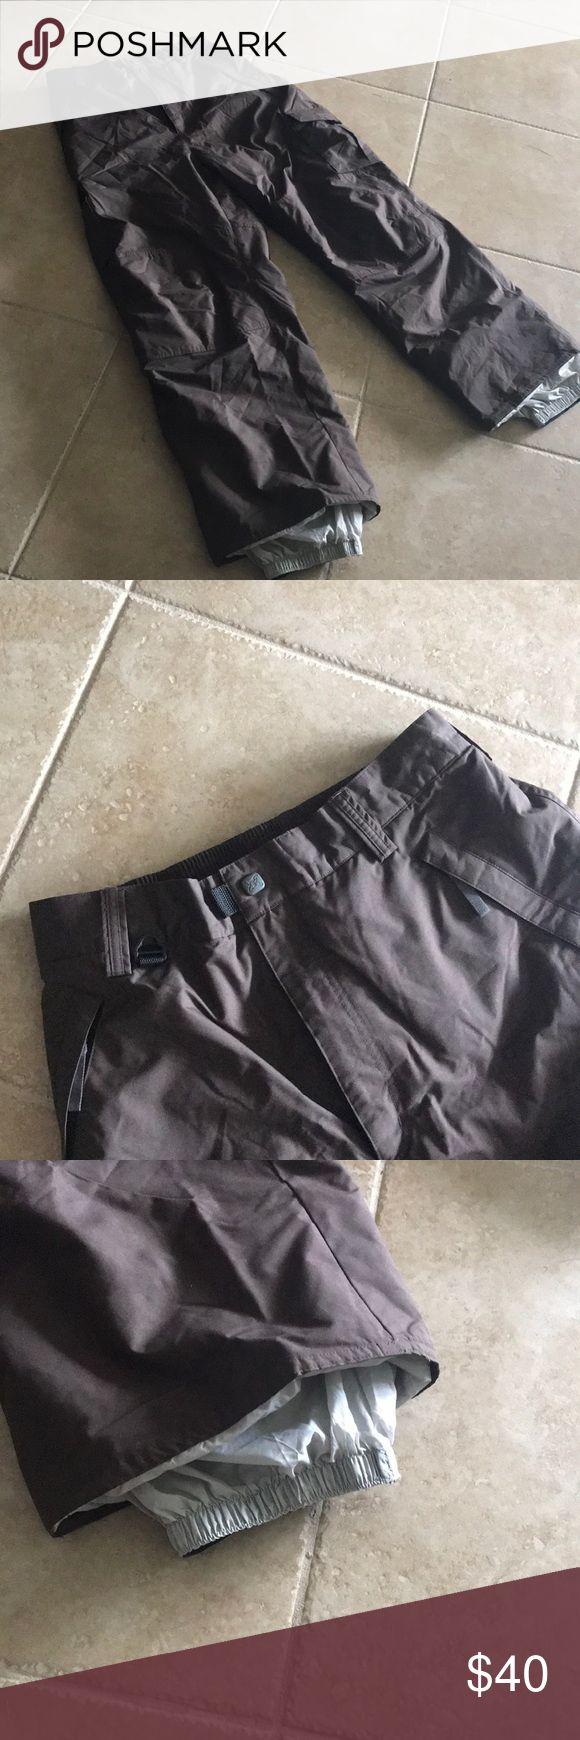 Men's ski pants Turbine chocolate brown ski pants with four pockets and gathered ankles Pants